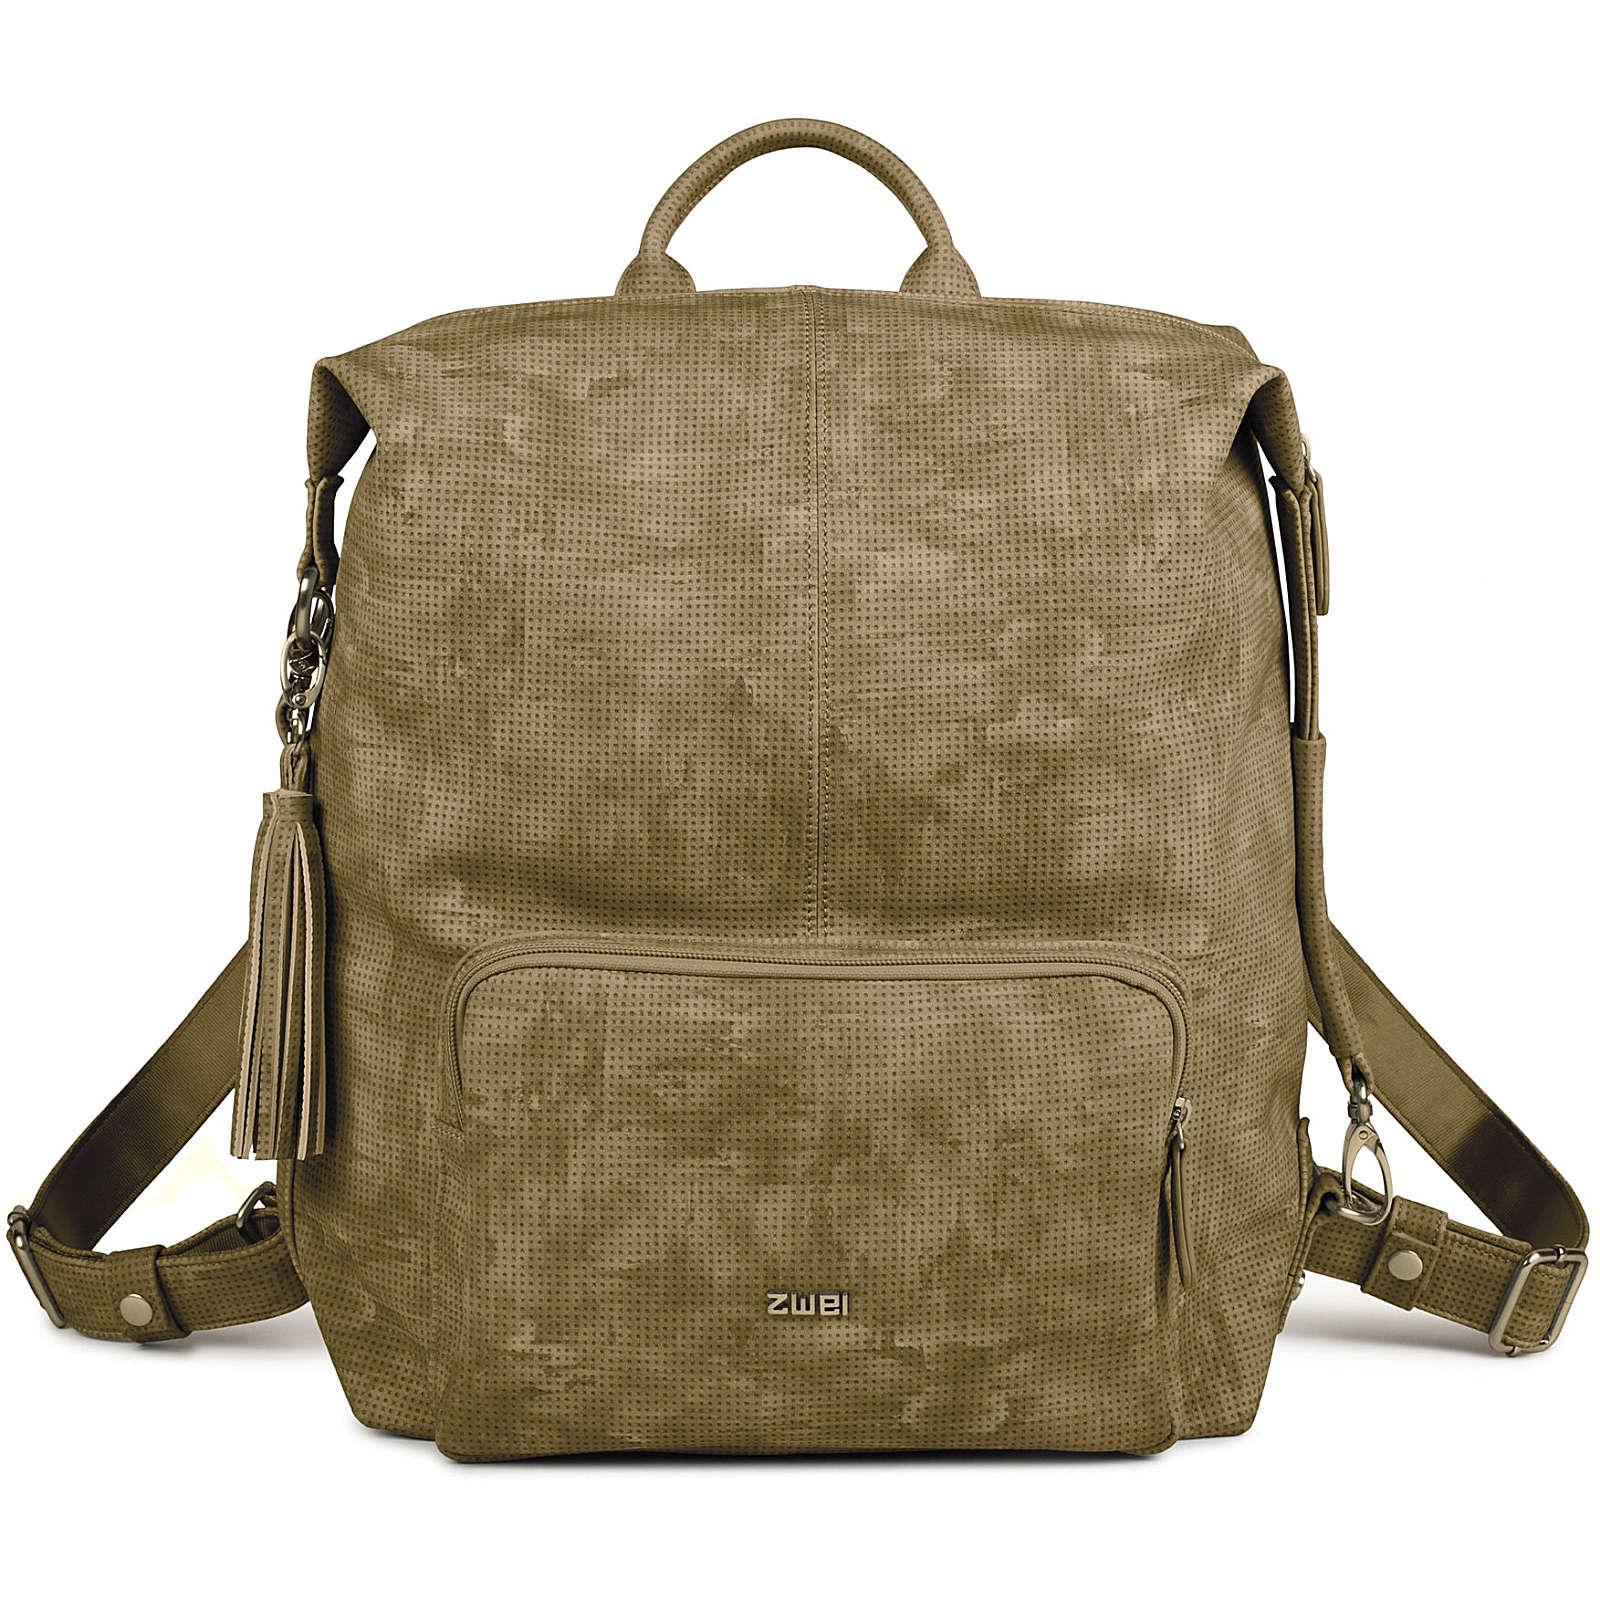 fb4b6984ebbeb Rabatt-Preisvergleich.de - Zwei Conny CYR20 Rucksack Tasche 35 cm ...